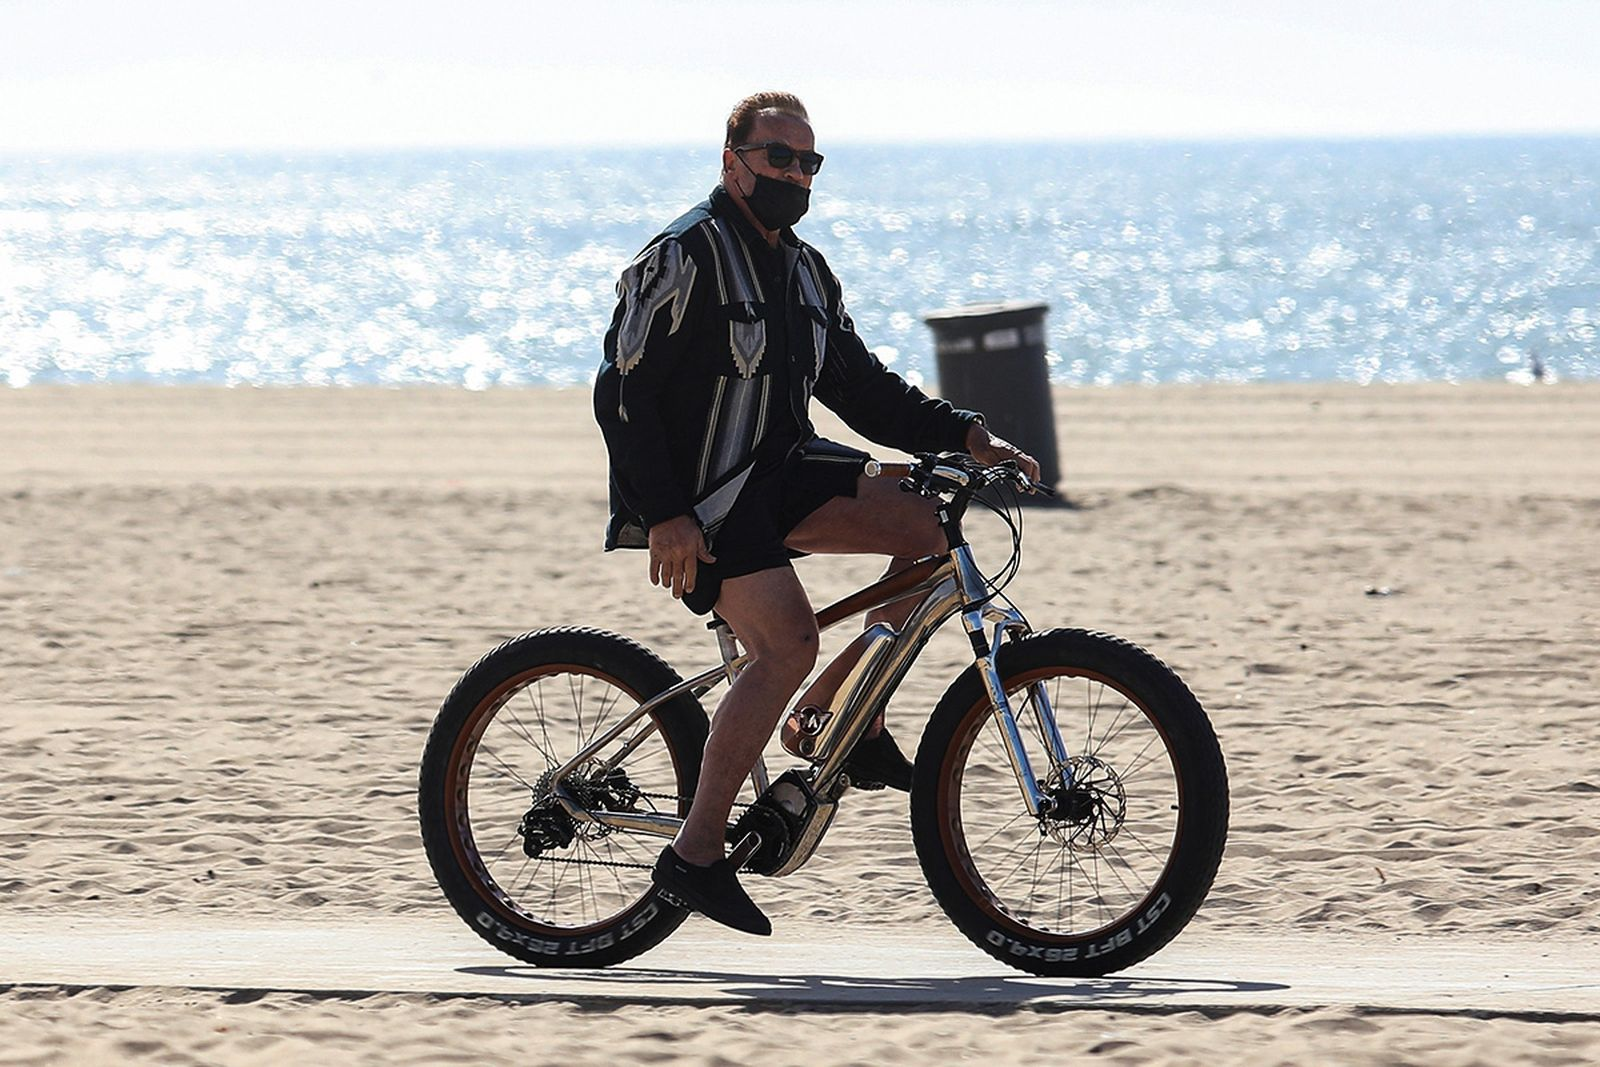 arnies-bike-drip-main